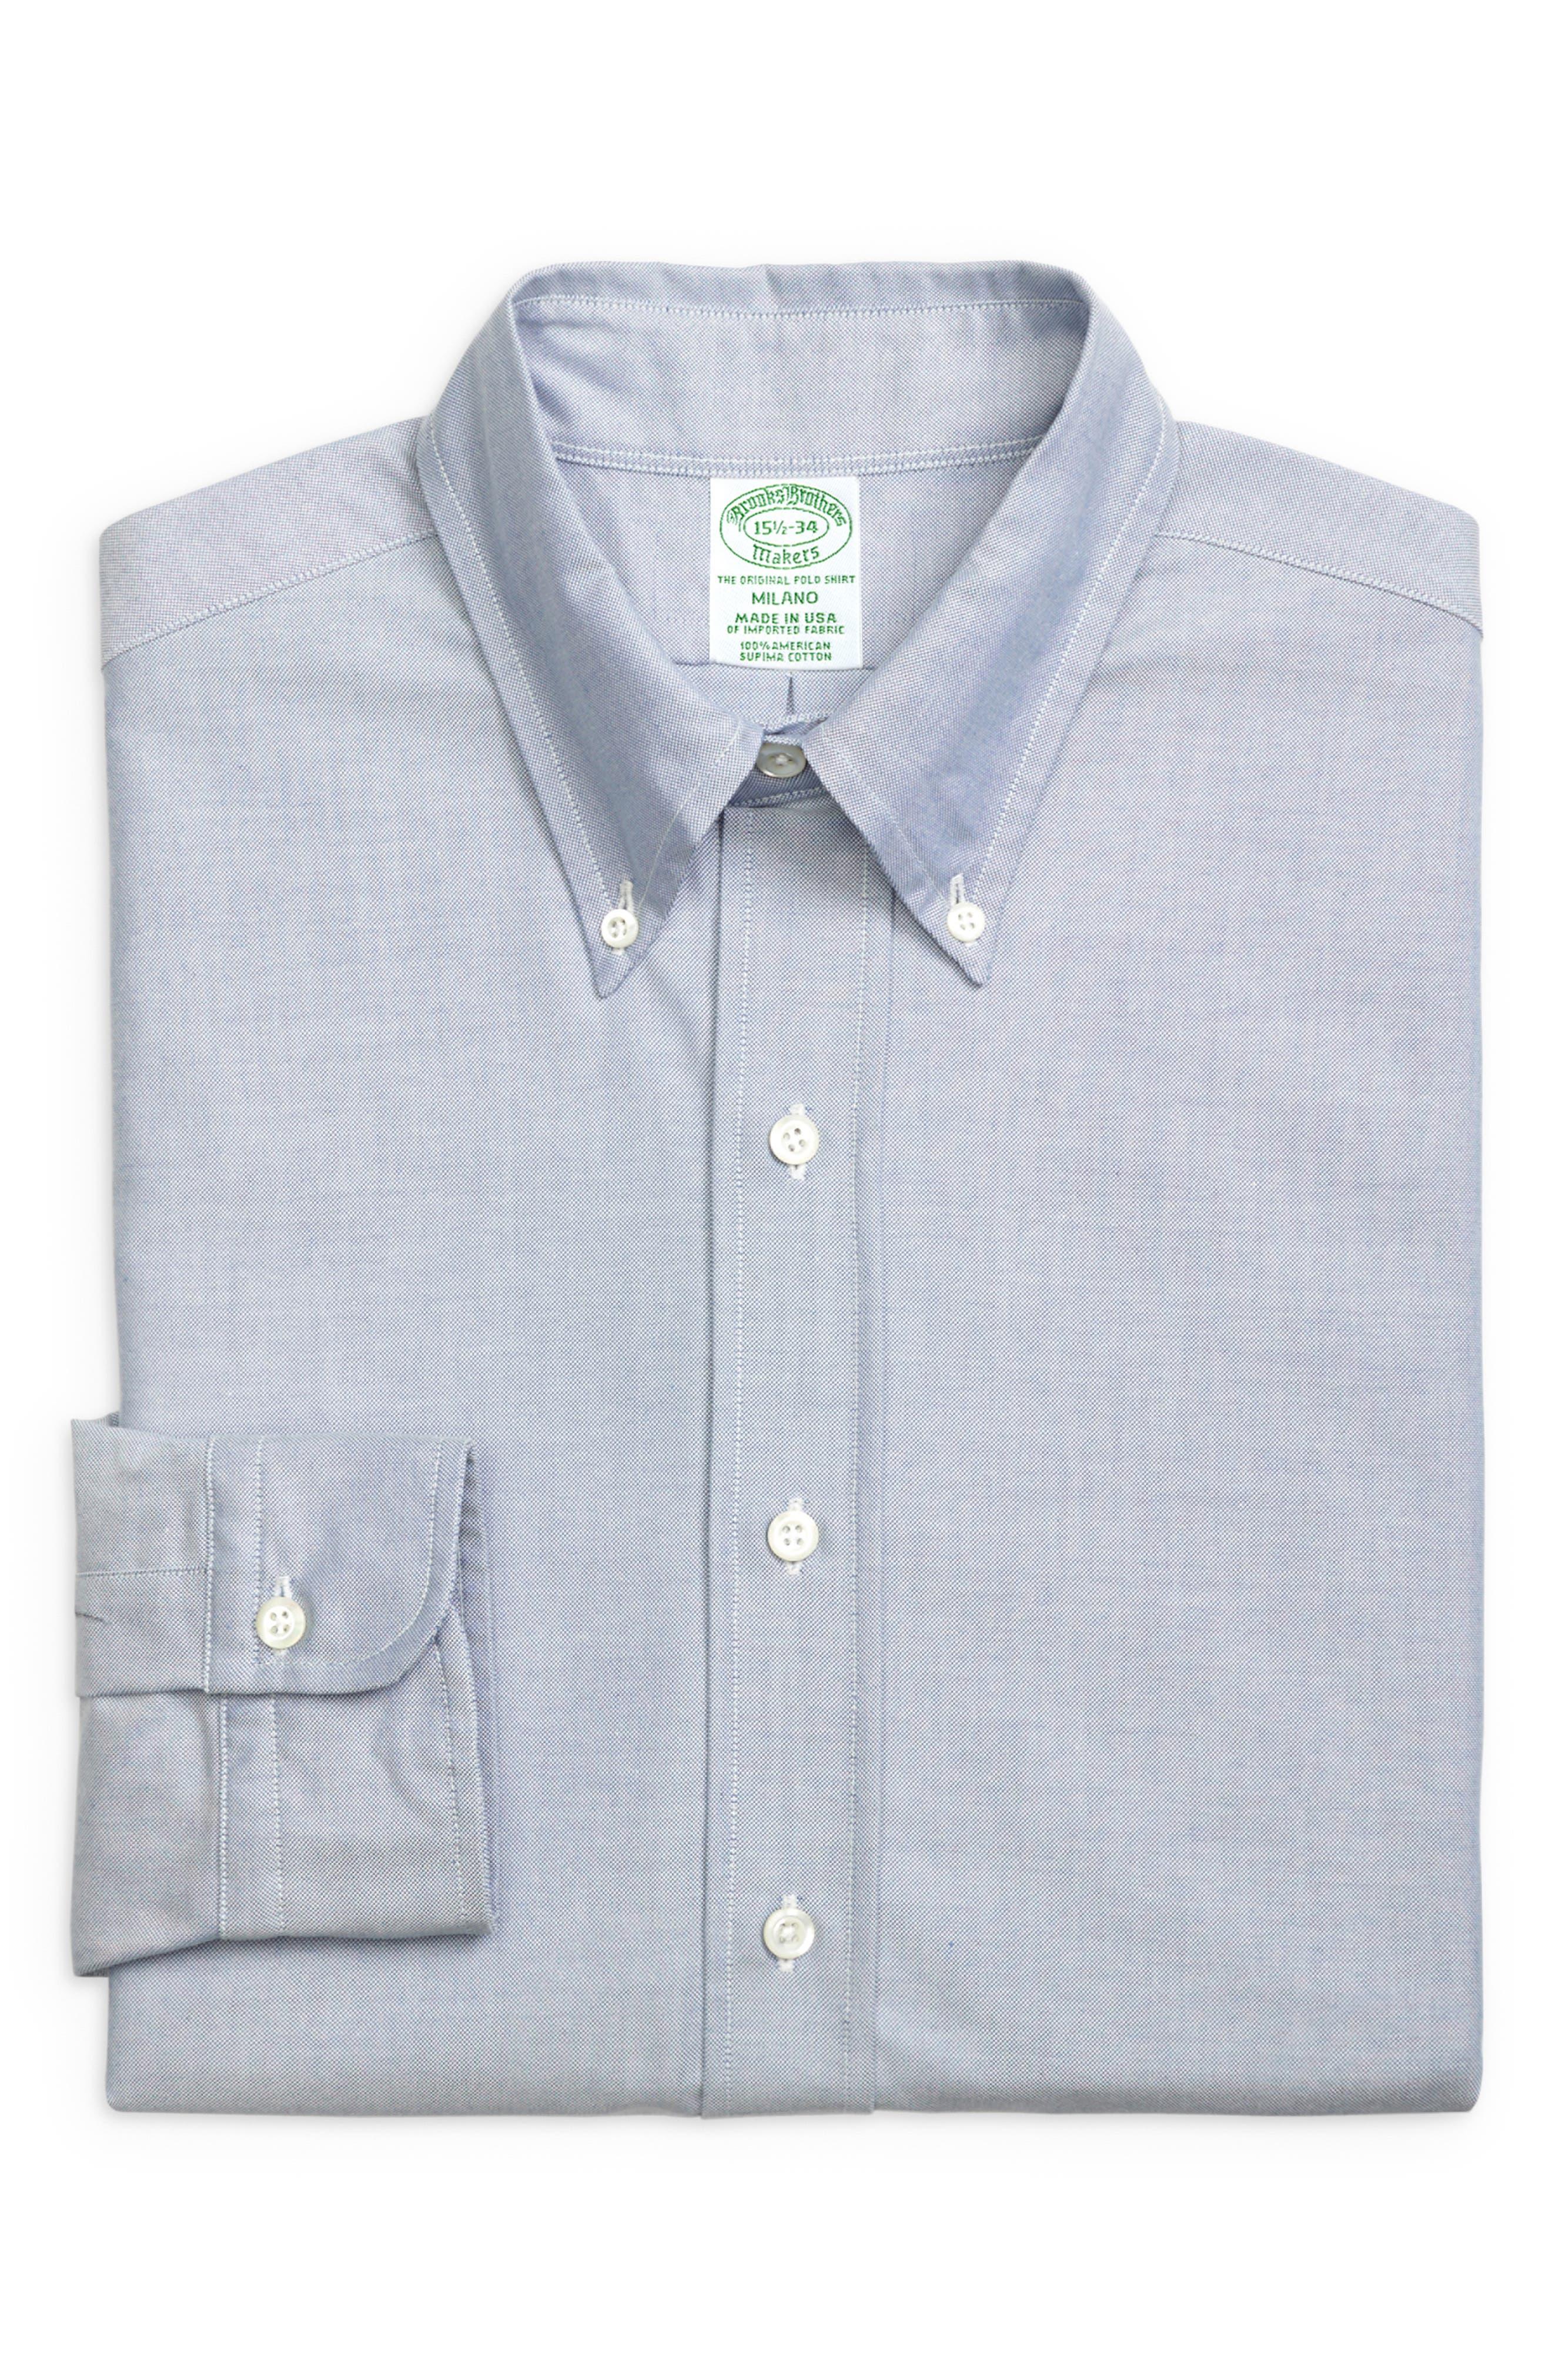 Milano Slim Fit Solid Dress Shirt